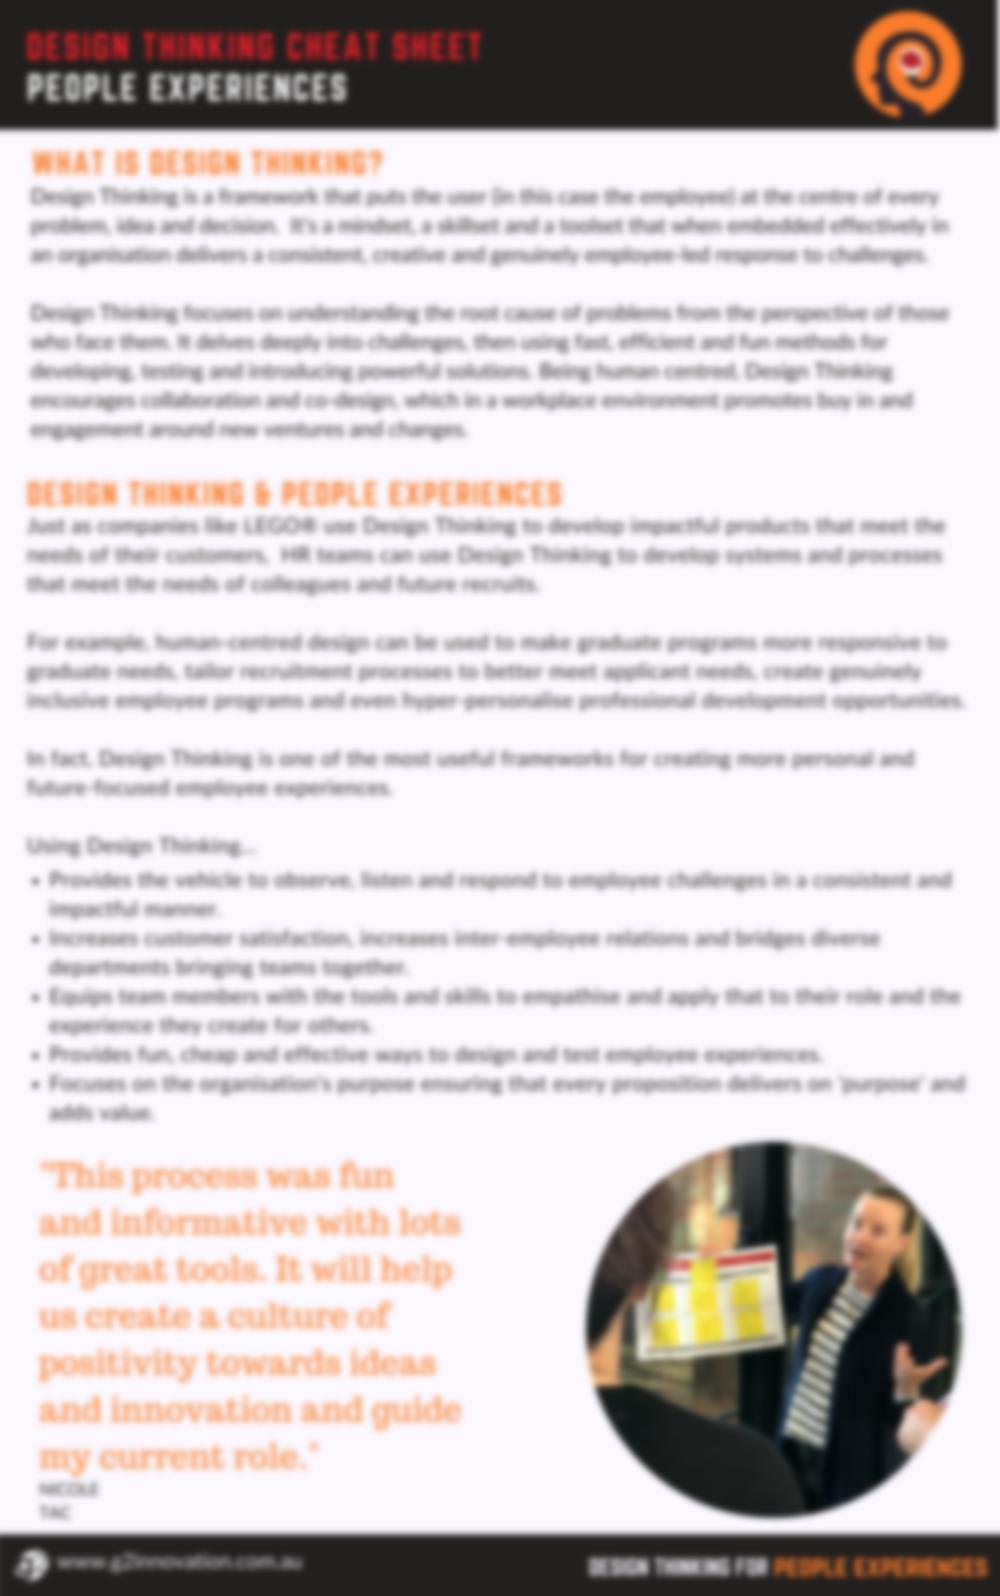 Cheat Sheet - Workforce Skills (1).png